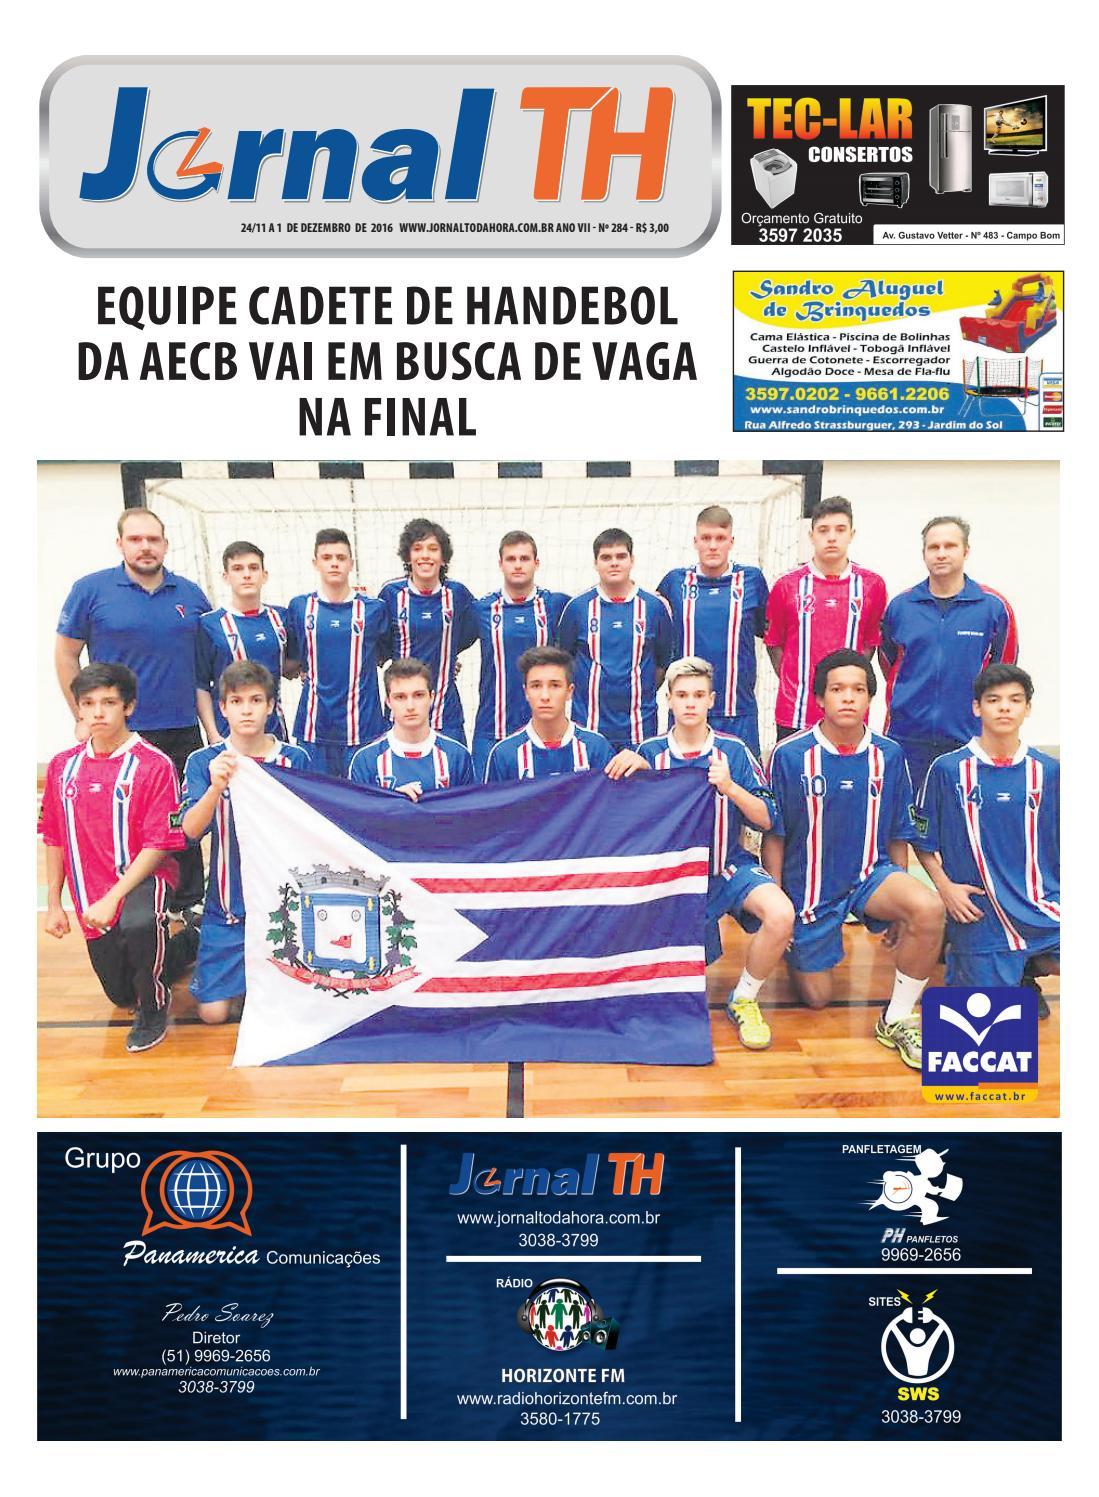 a8277f9a2 Novembro 2016 4 by Jornal Toda Hora - issuu